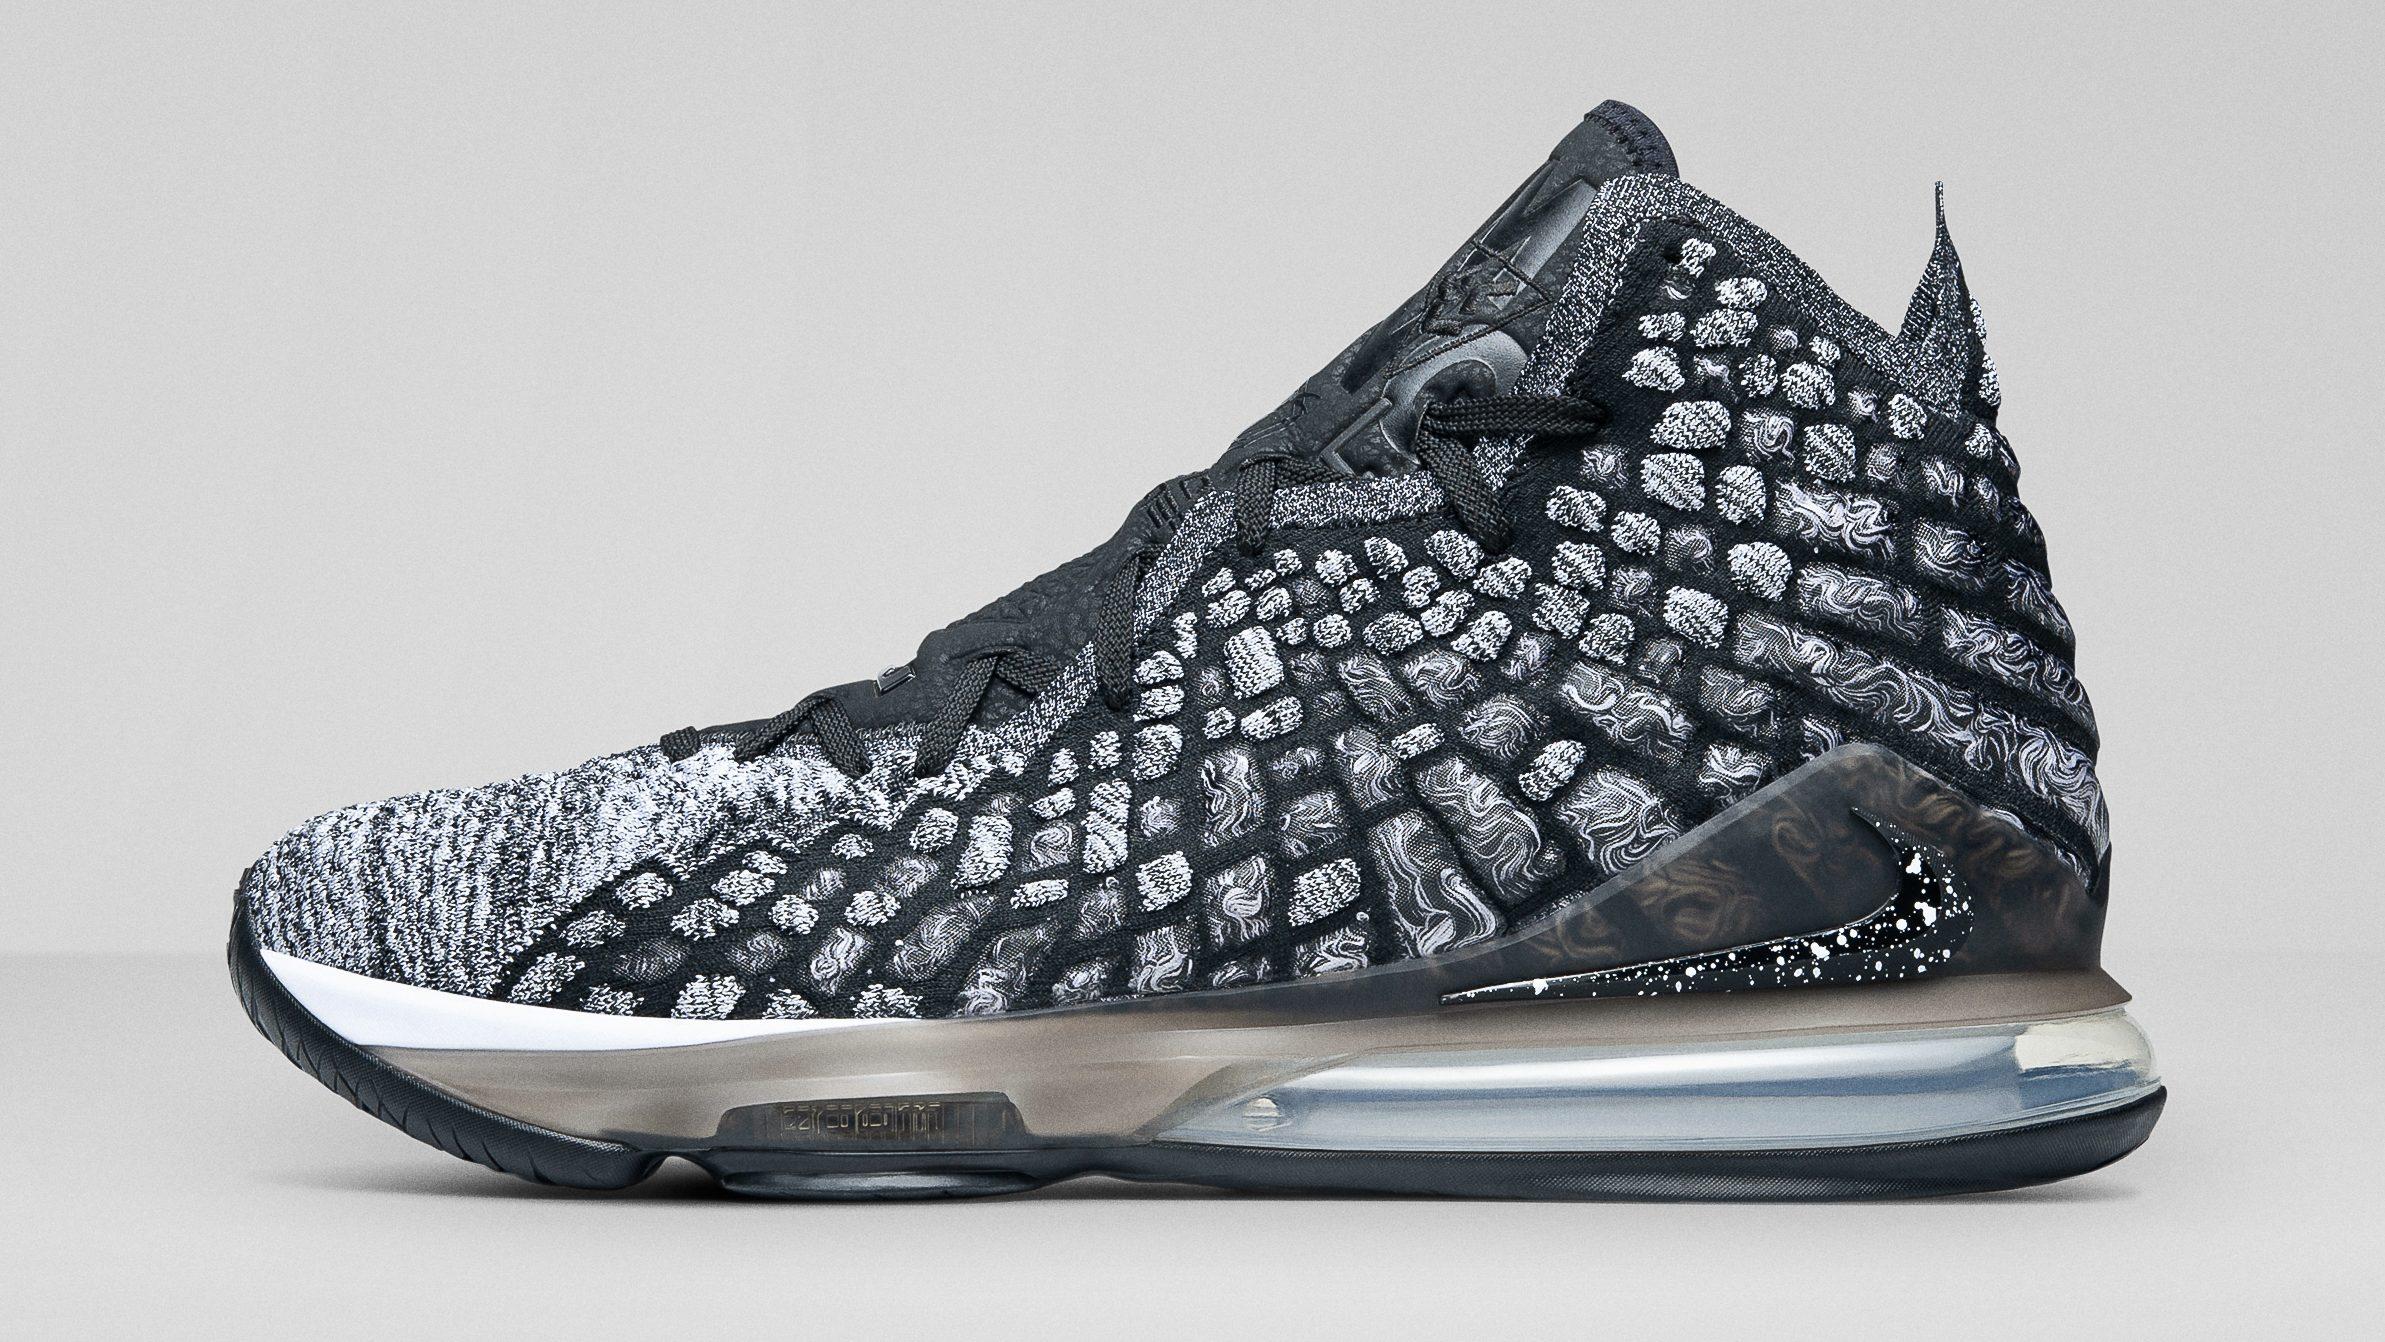 Nike LeBron 17 Release Date Info: How